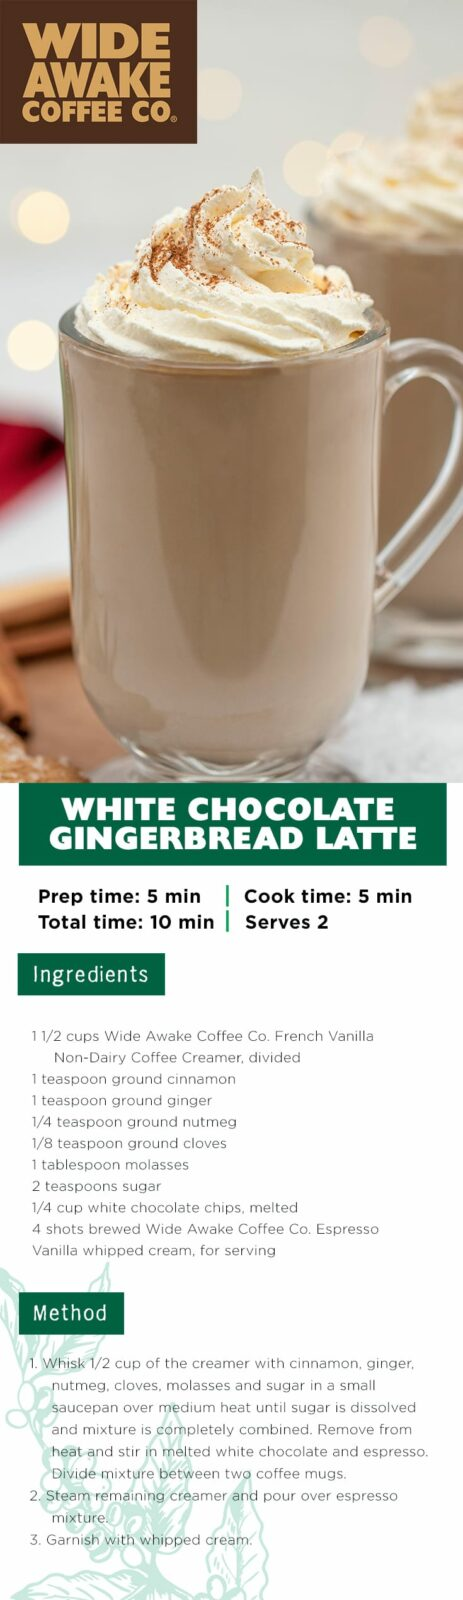 WideAwake_PinterestPinPinterest_White Chocolate Gingerbread Latte